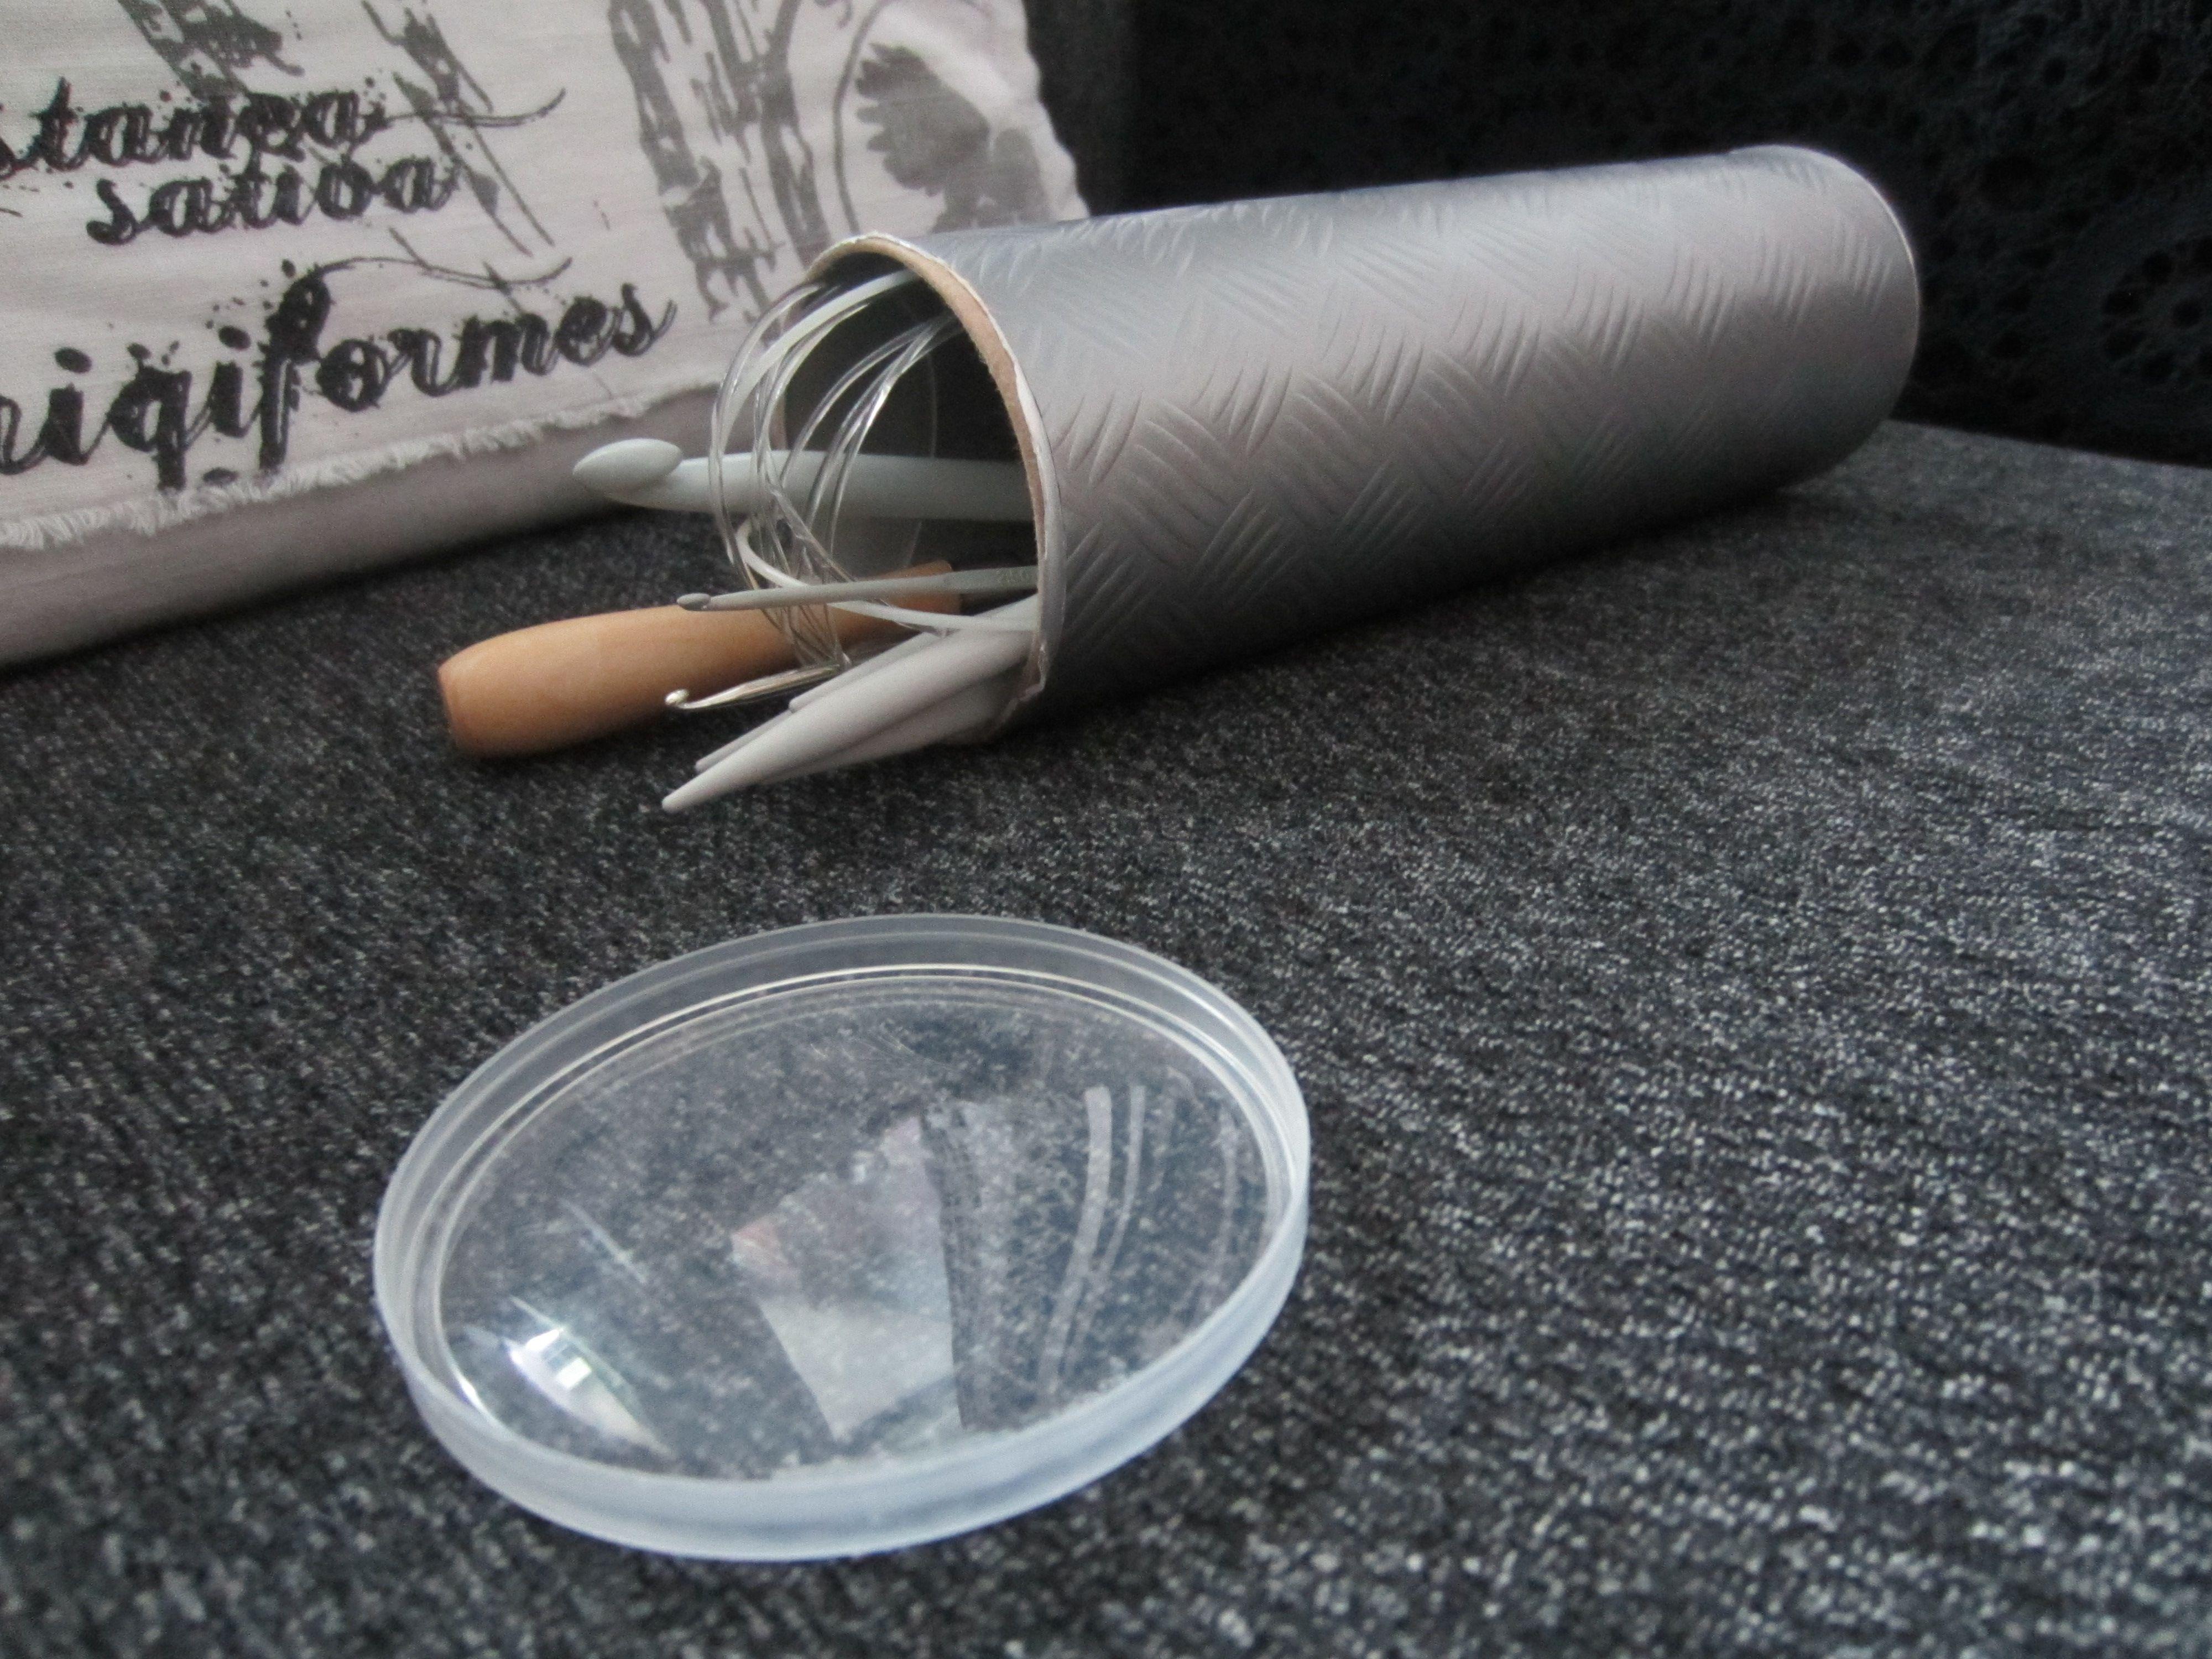 Tee-se-itse-naisen sisustusblogi: D-c-fix Covered Pringles Tube